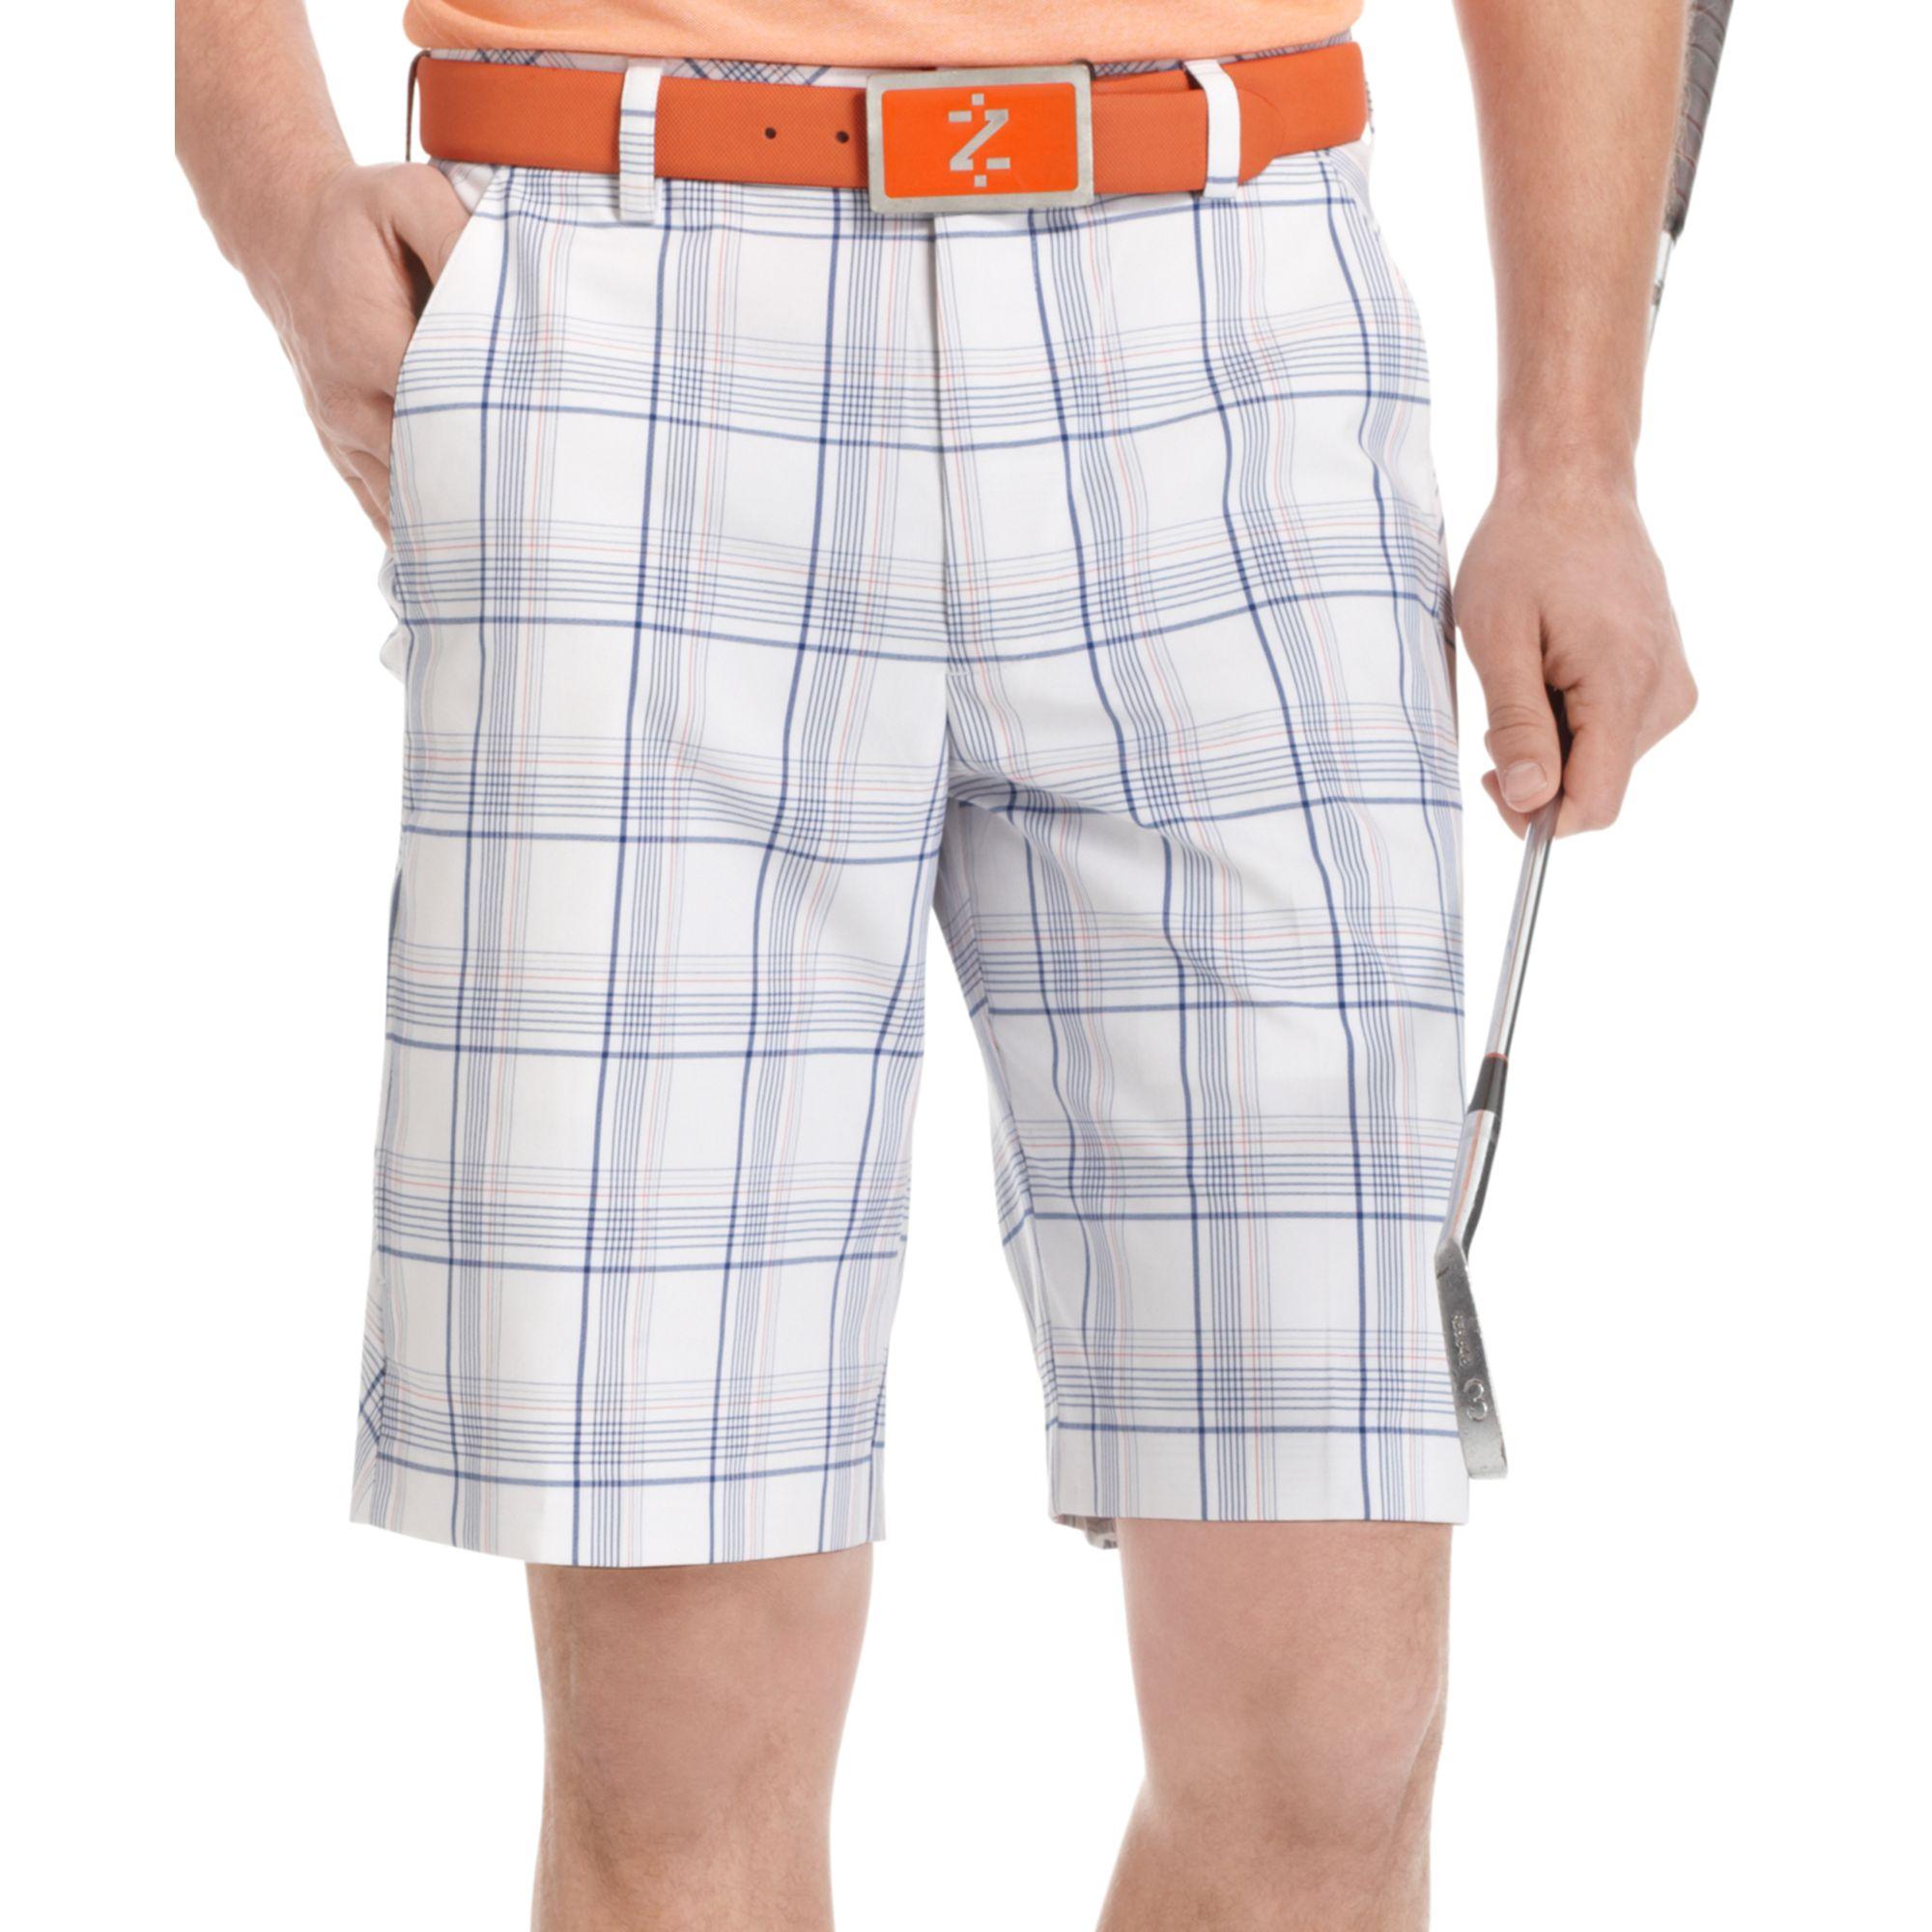 b1ed751abb Izod Flat Front Plaid Golf Shorts in Blue for Men - Lyst